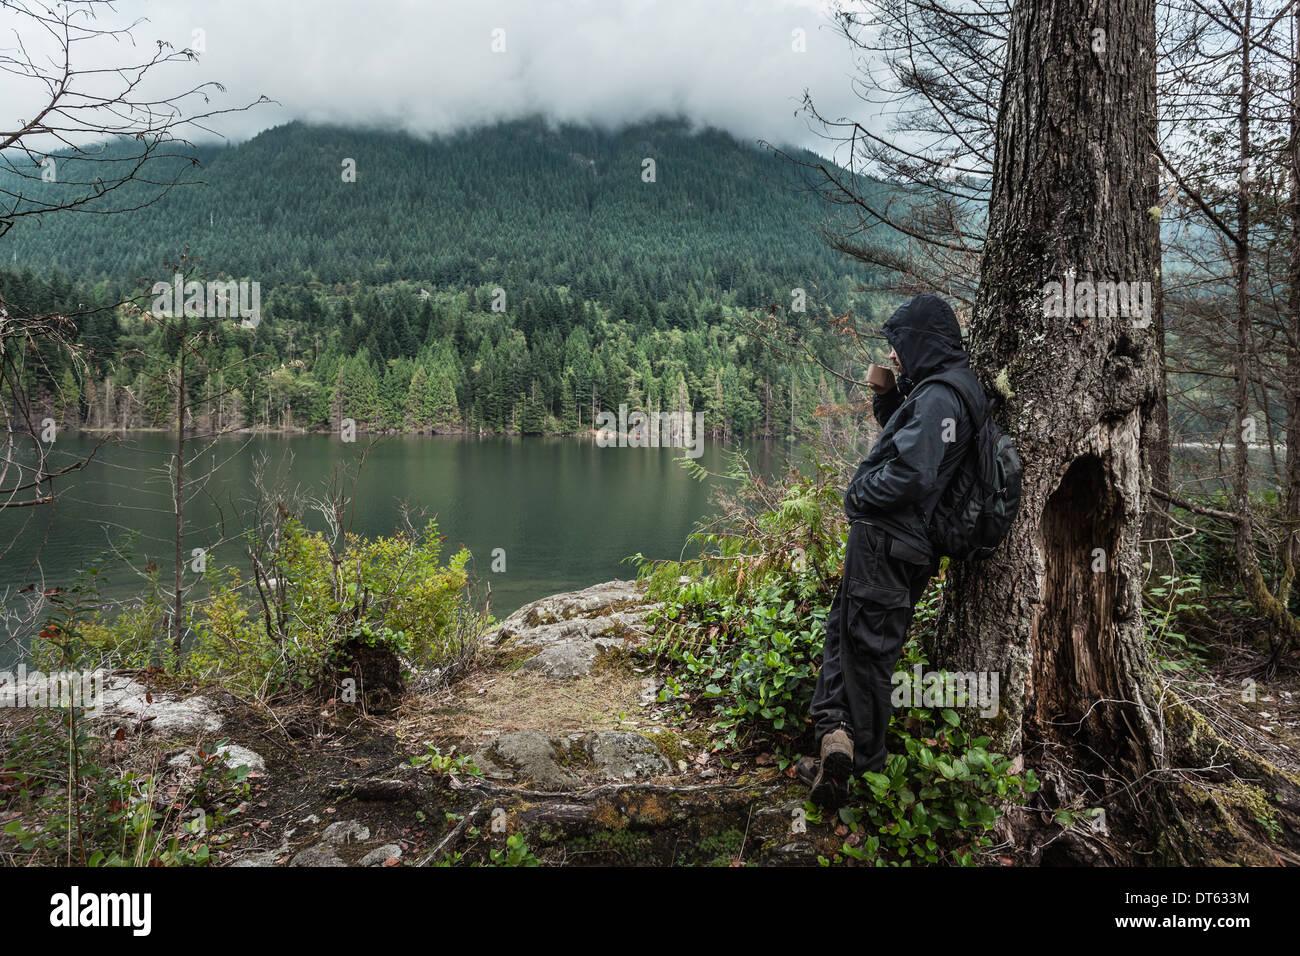 Hombre vestido con ropa impermeable por árbol, Buntzen Lake, British Columbia, Canadá Imagen De Stock